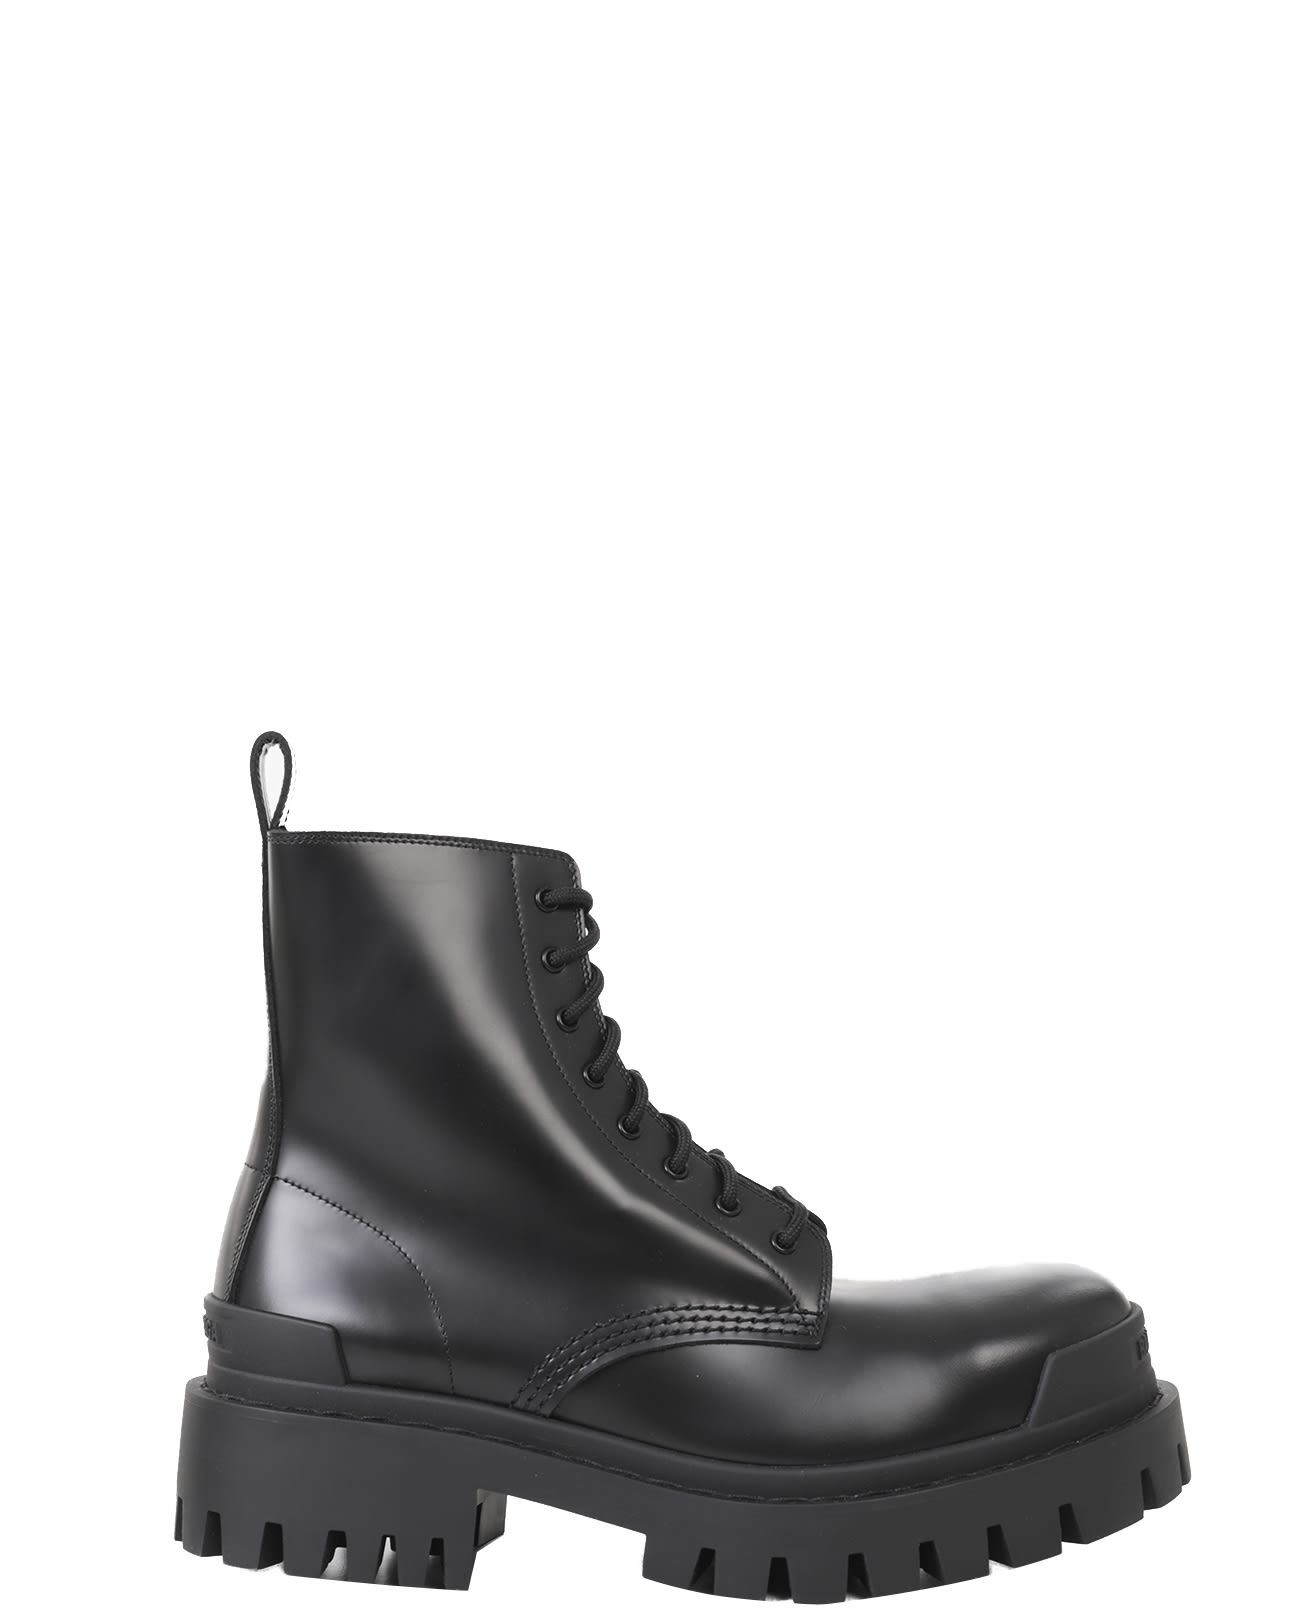 Balenciaga Black Strike Boots L20